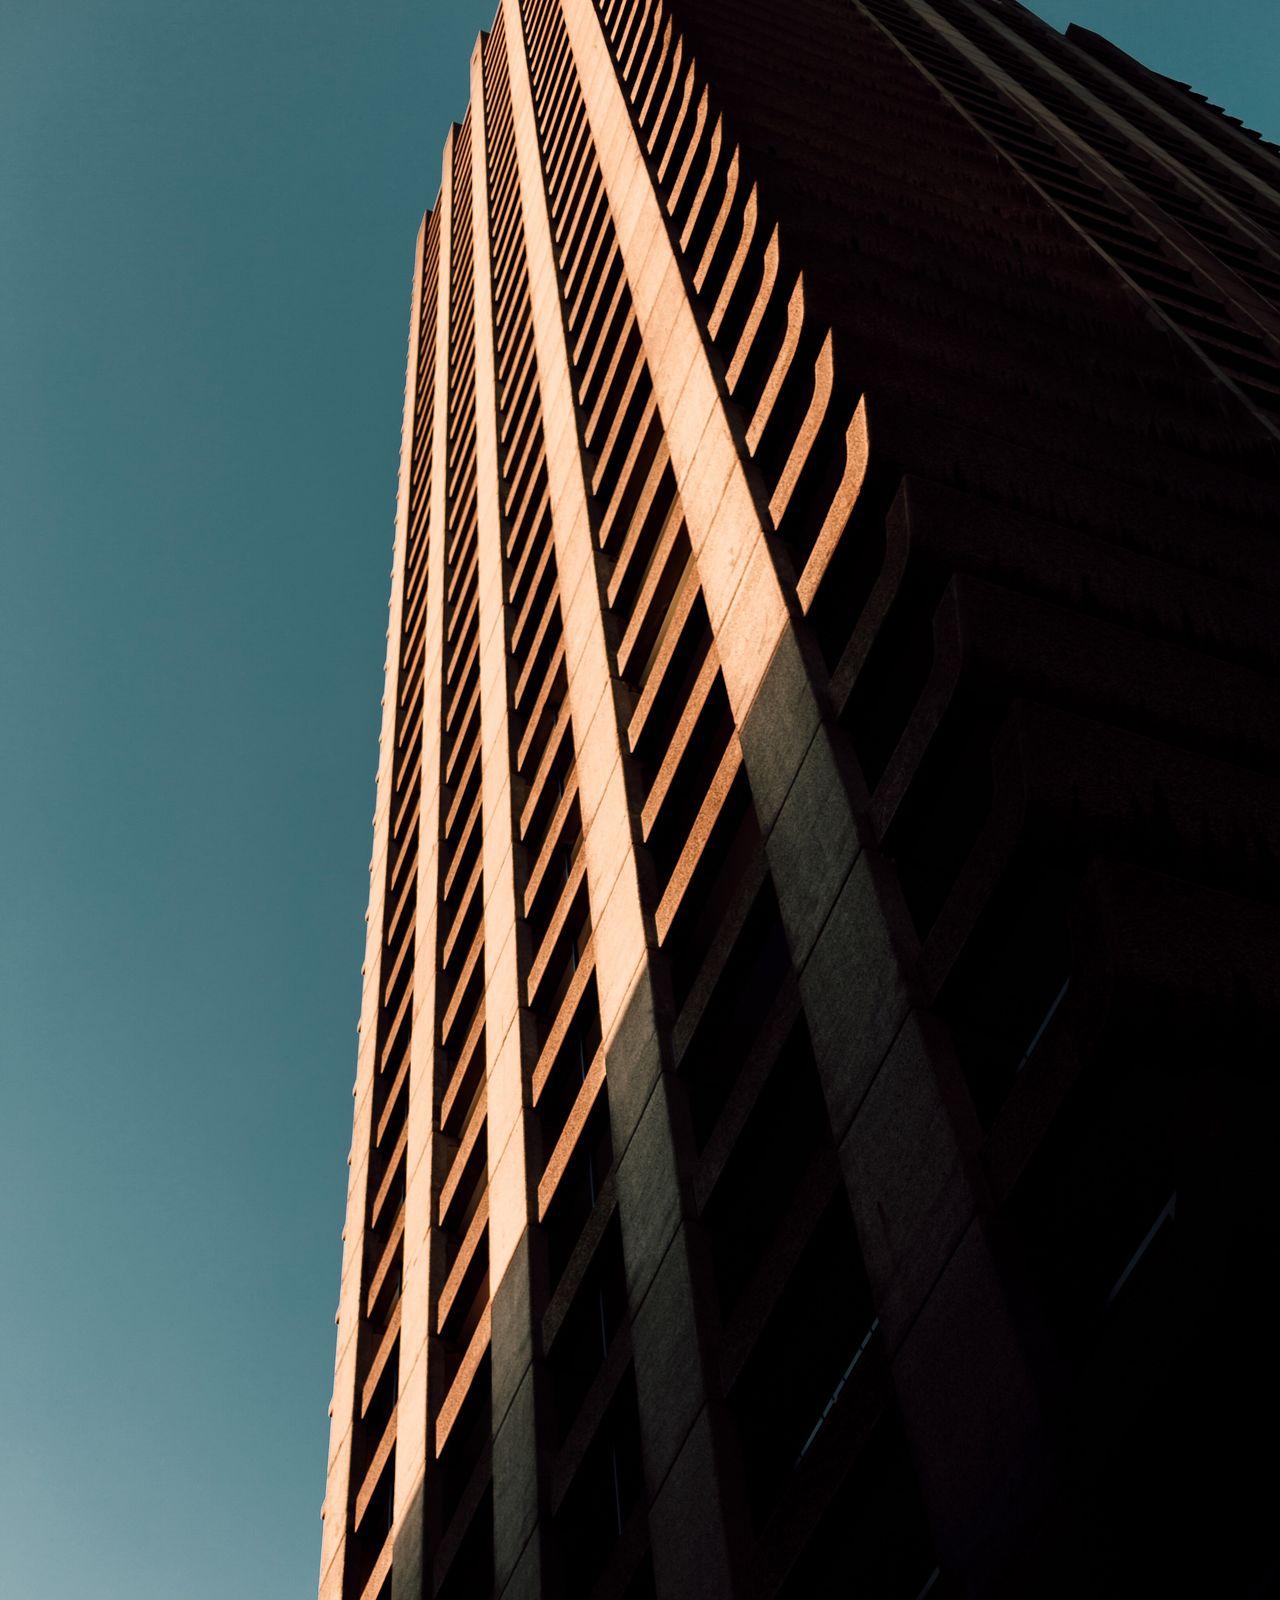 Minimalist Architecture Barbican vibes Architecture EyeEm Best Shots Cityscape London